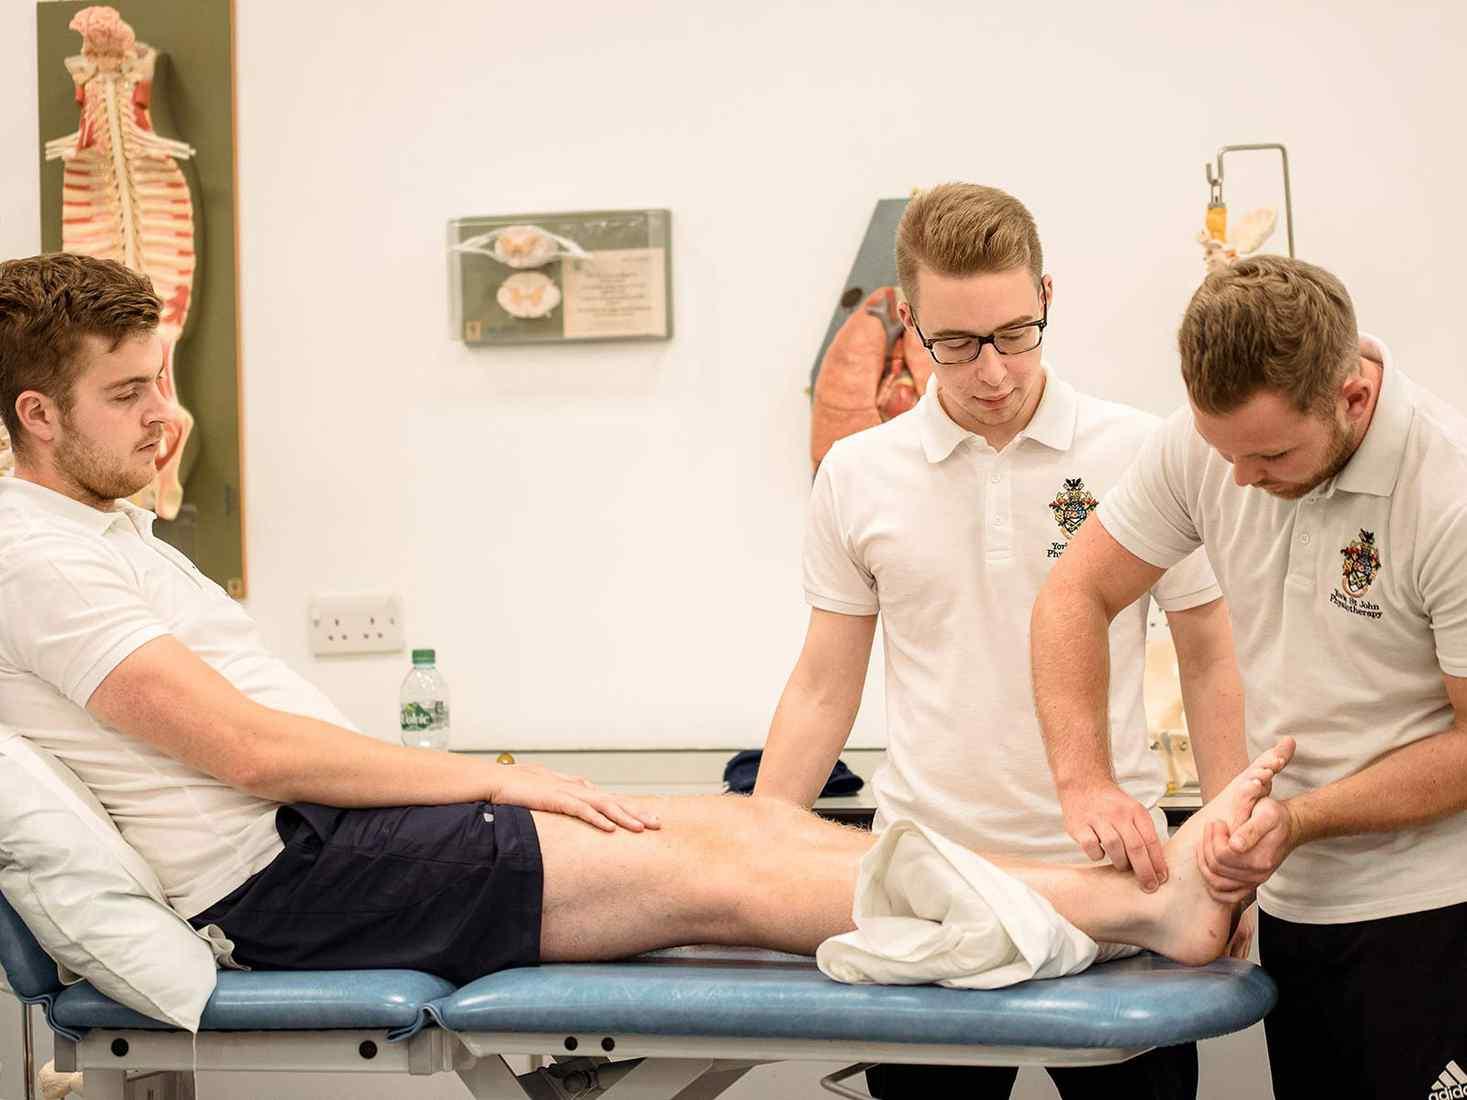 The physio dating simulator walkthrough